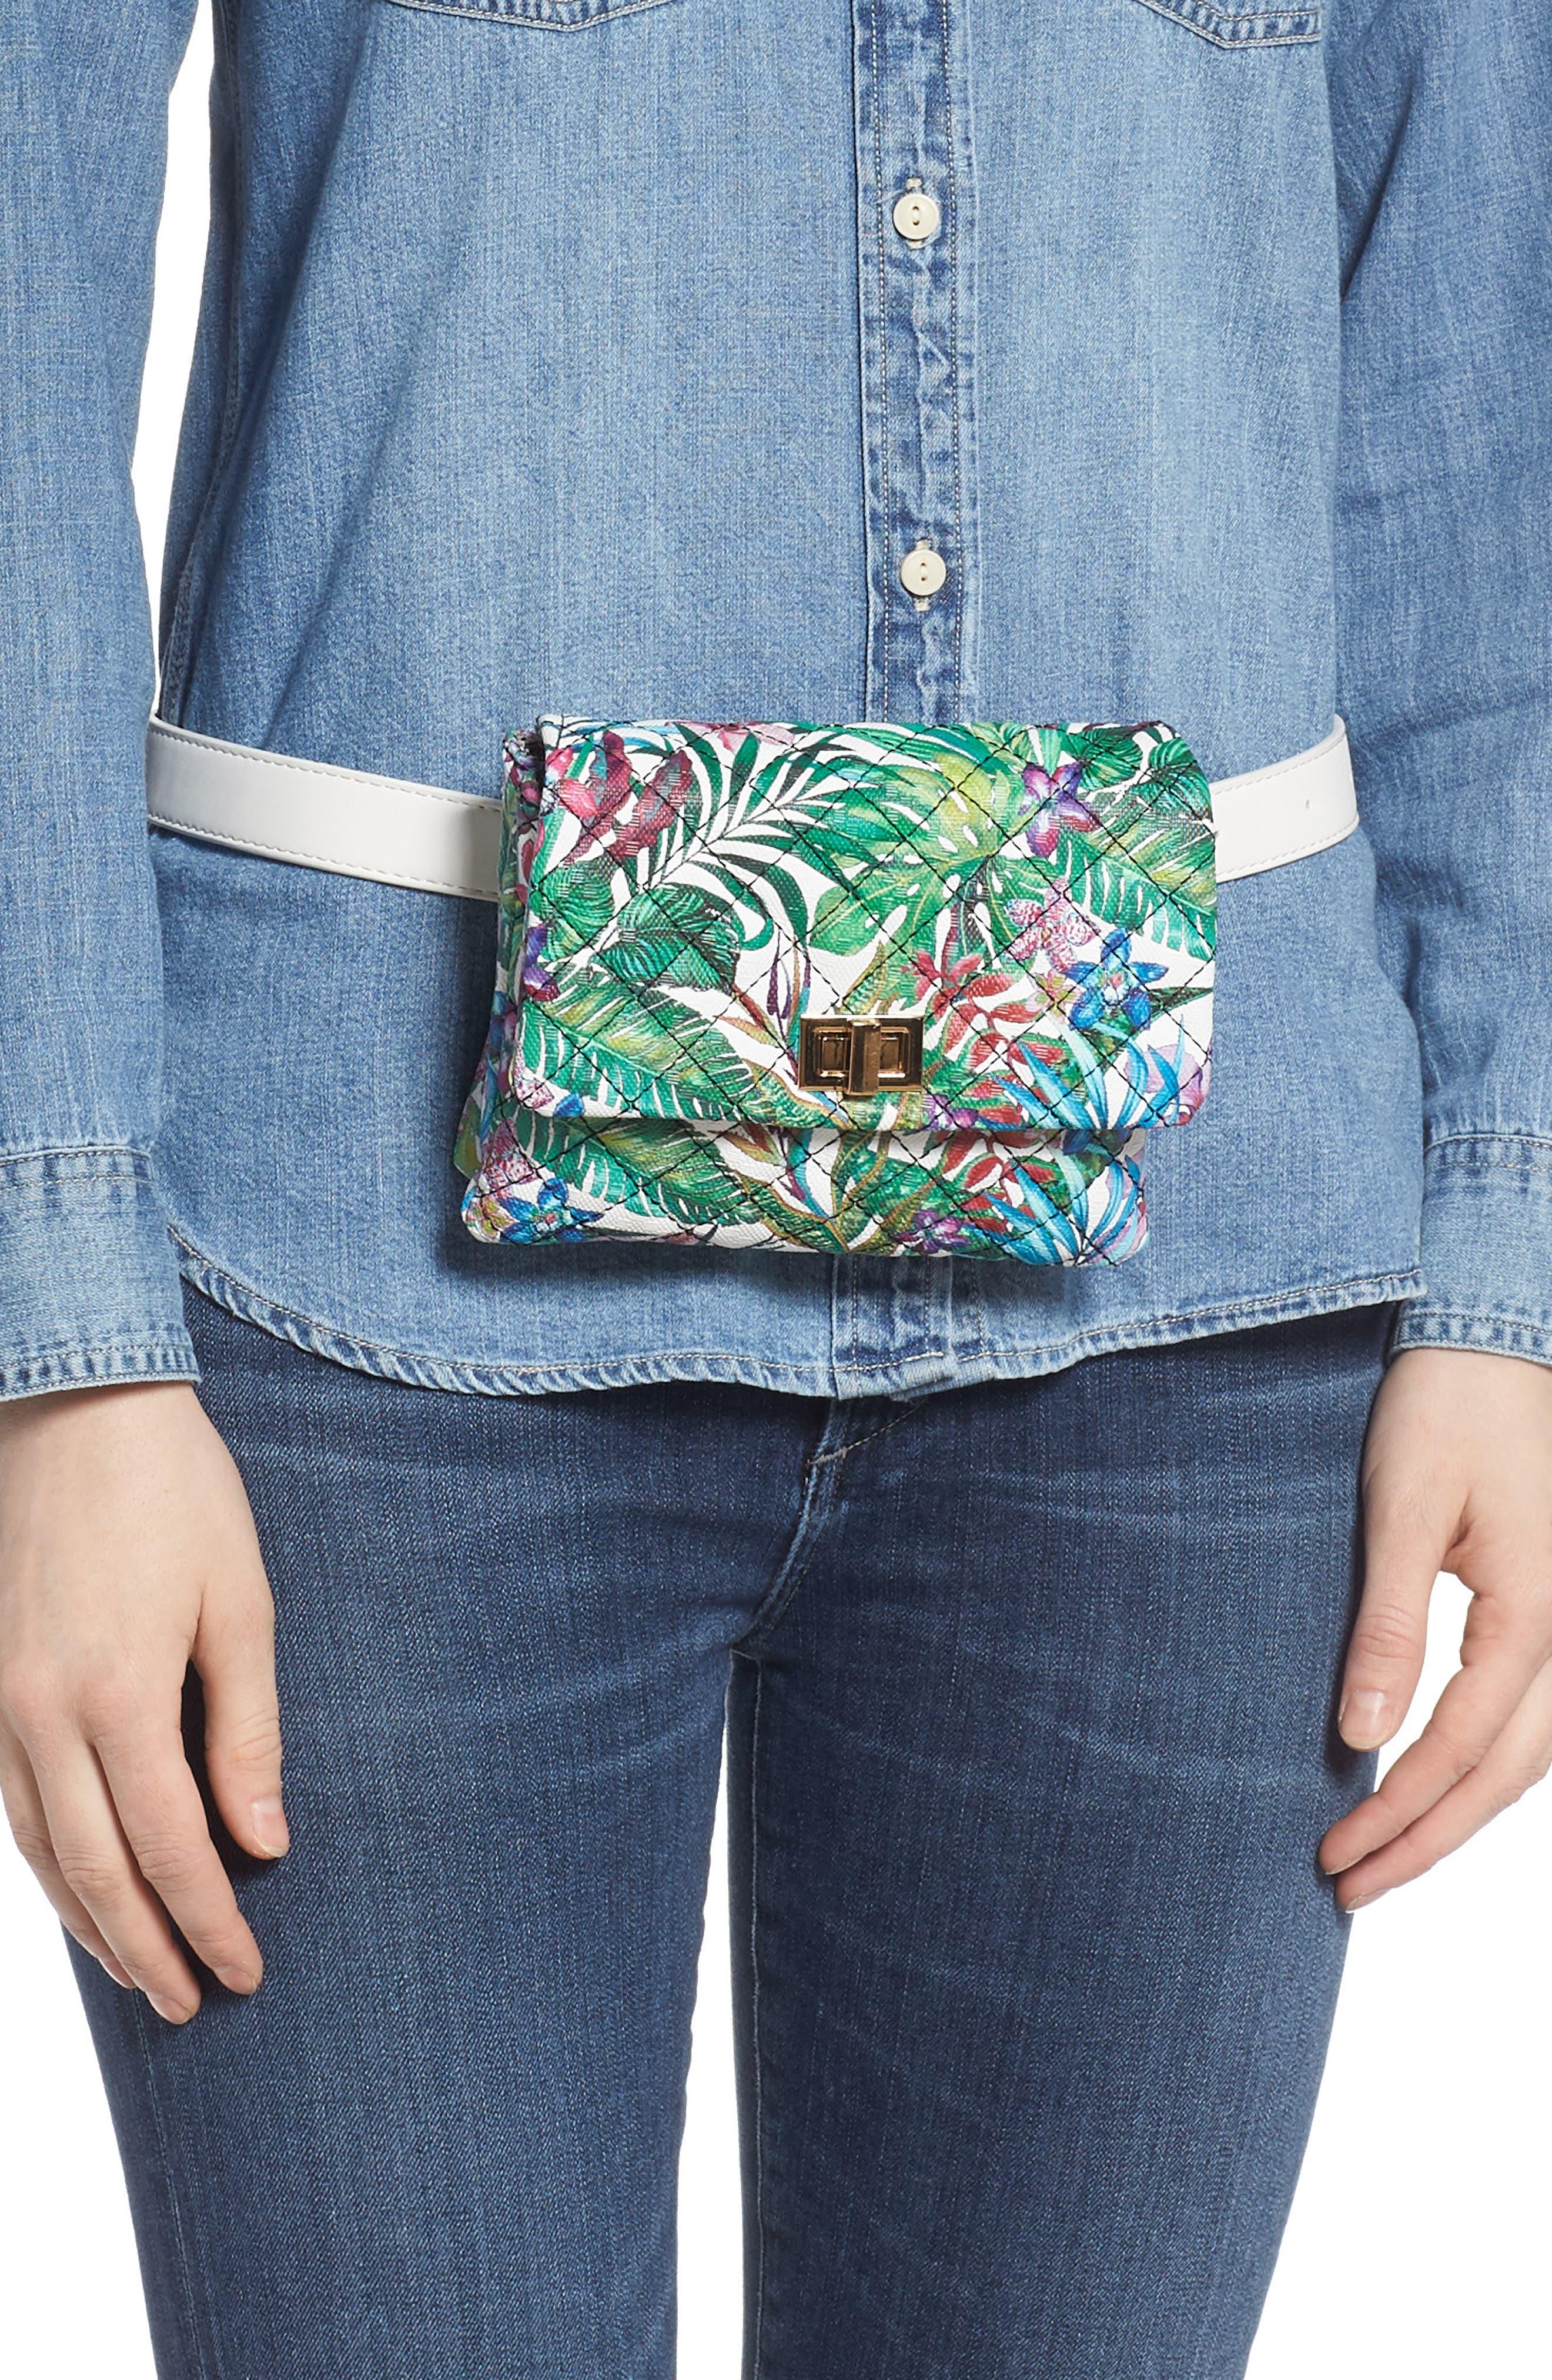 MALI + LILI, Quilted Vegan Leather Belt Bag, Alternate thumbnail 2, color, 101